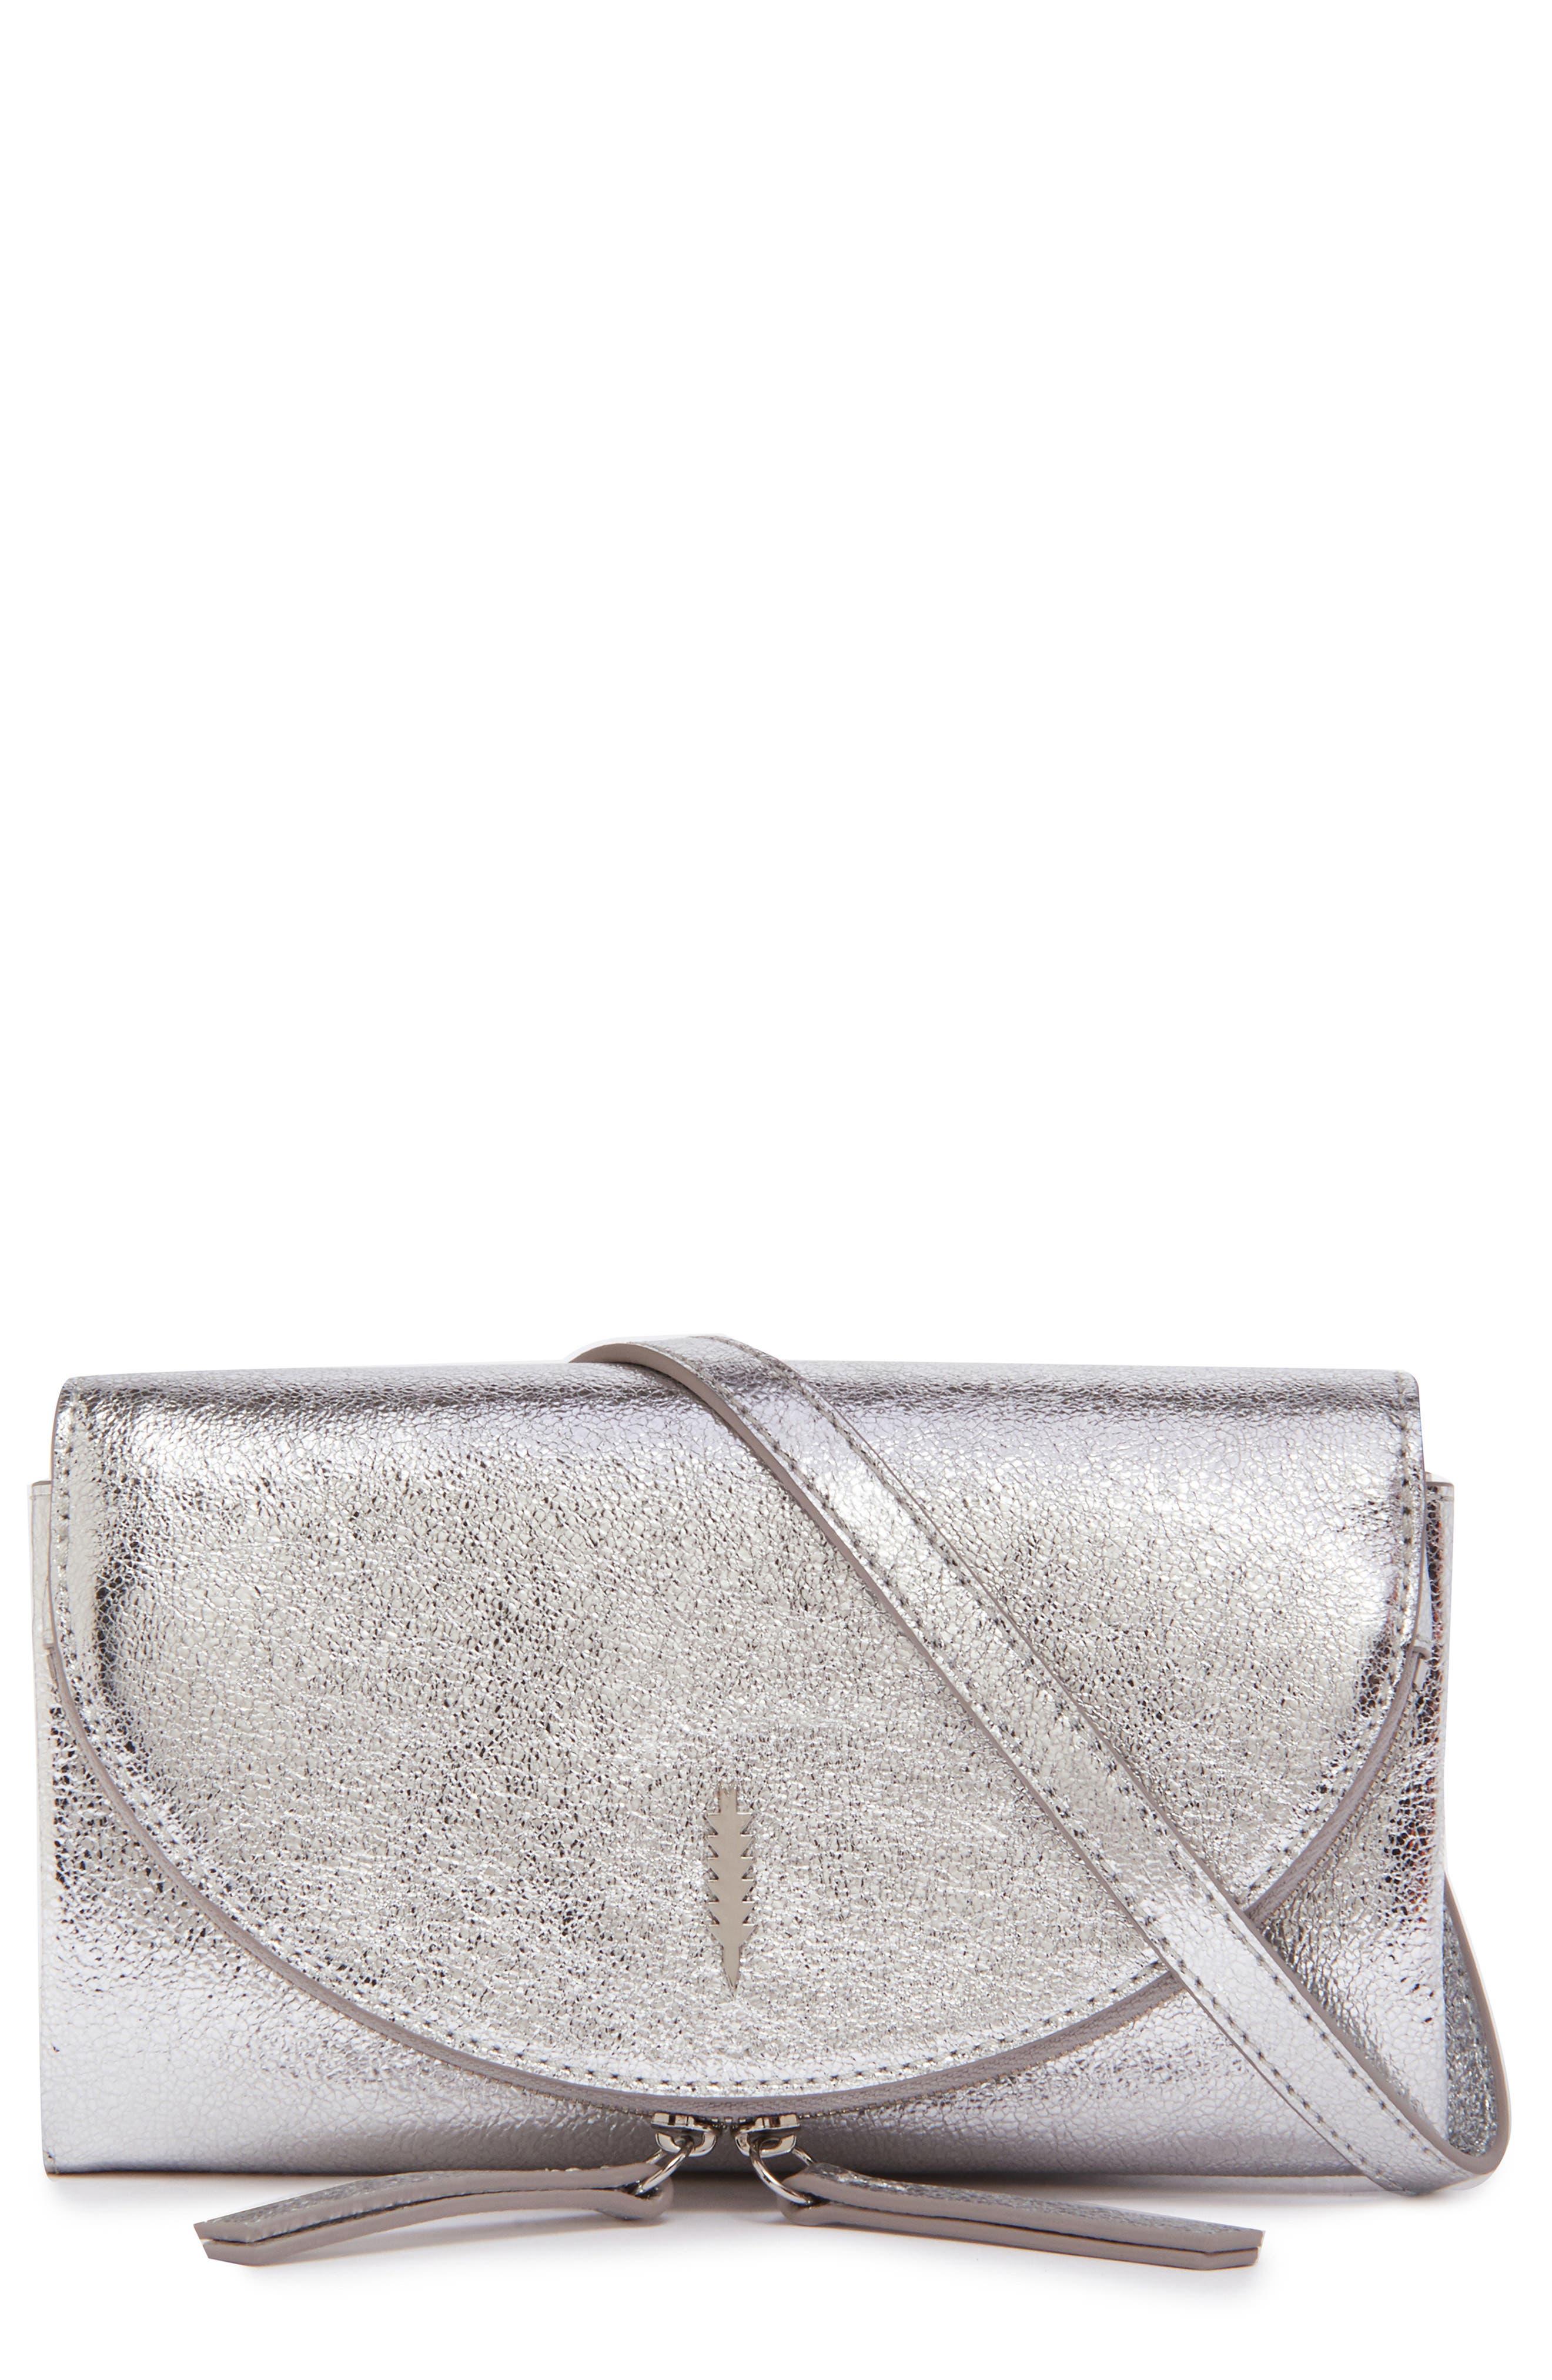 Image of THACKER Nikki Crossbody Bag